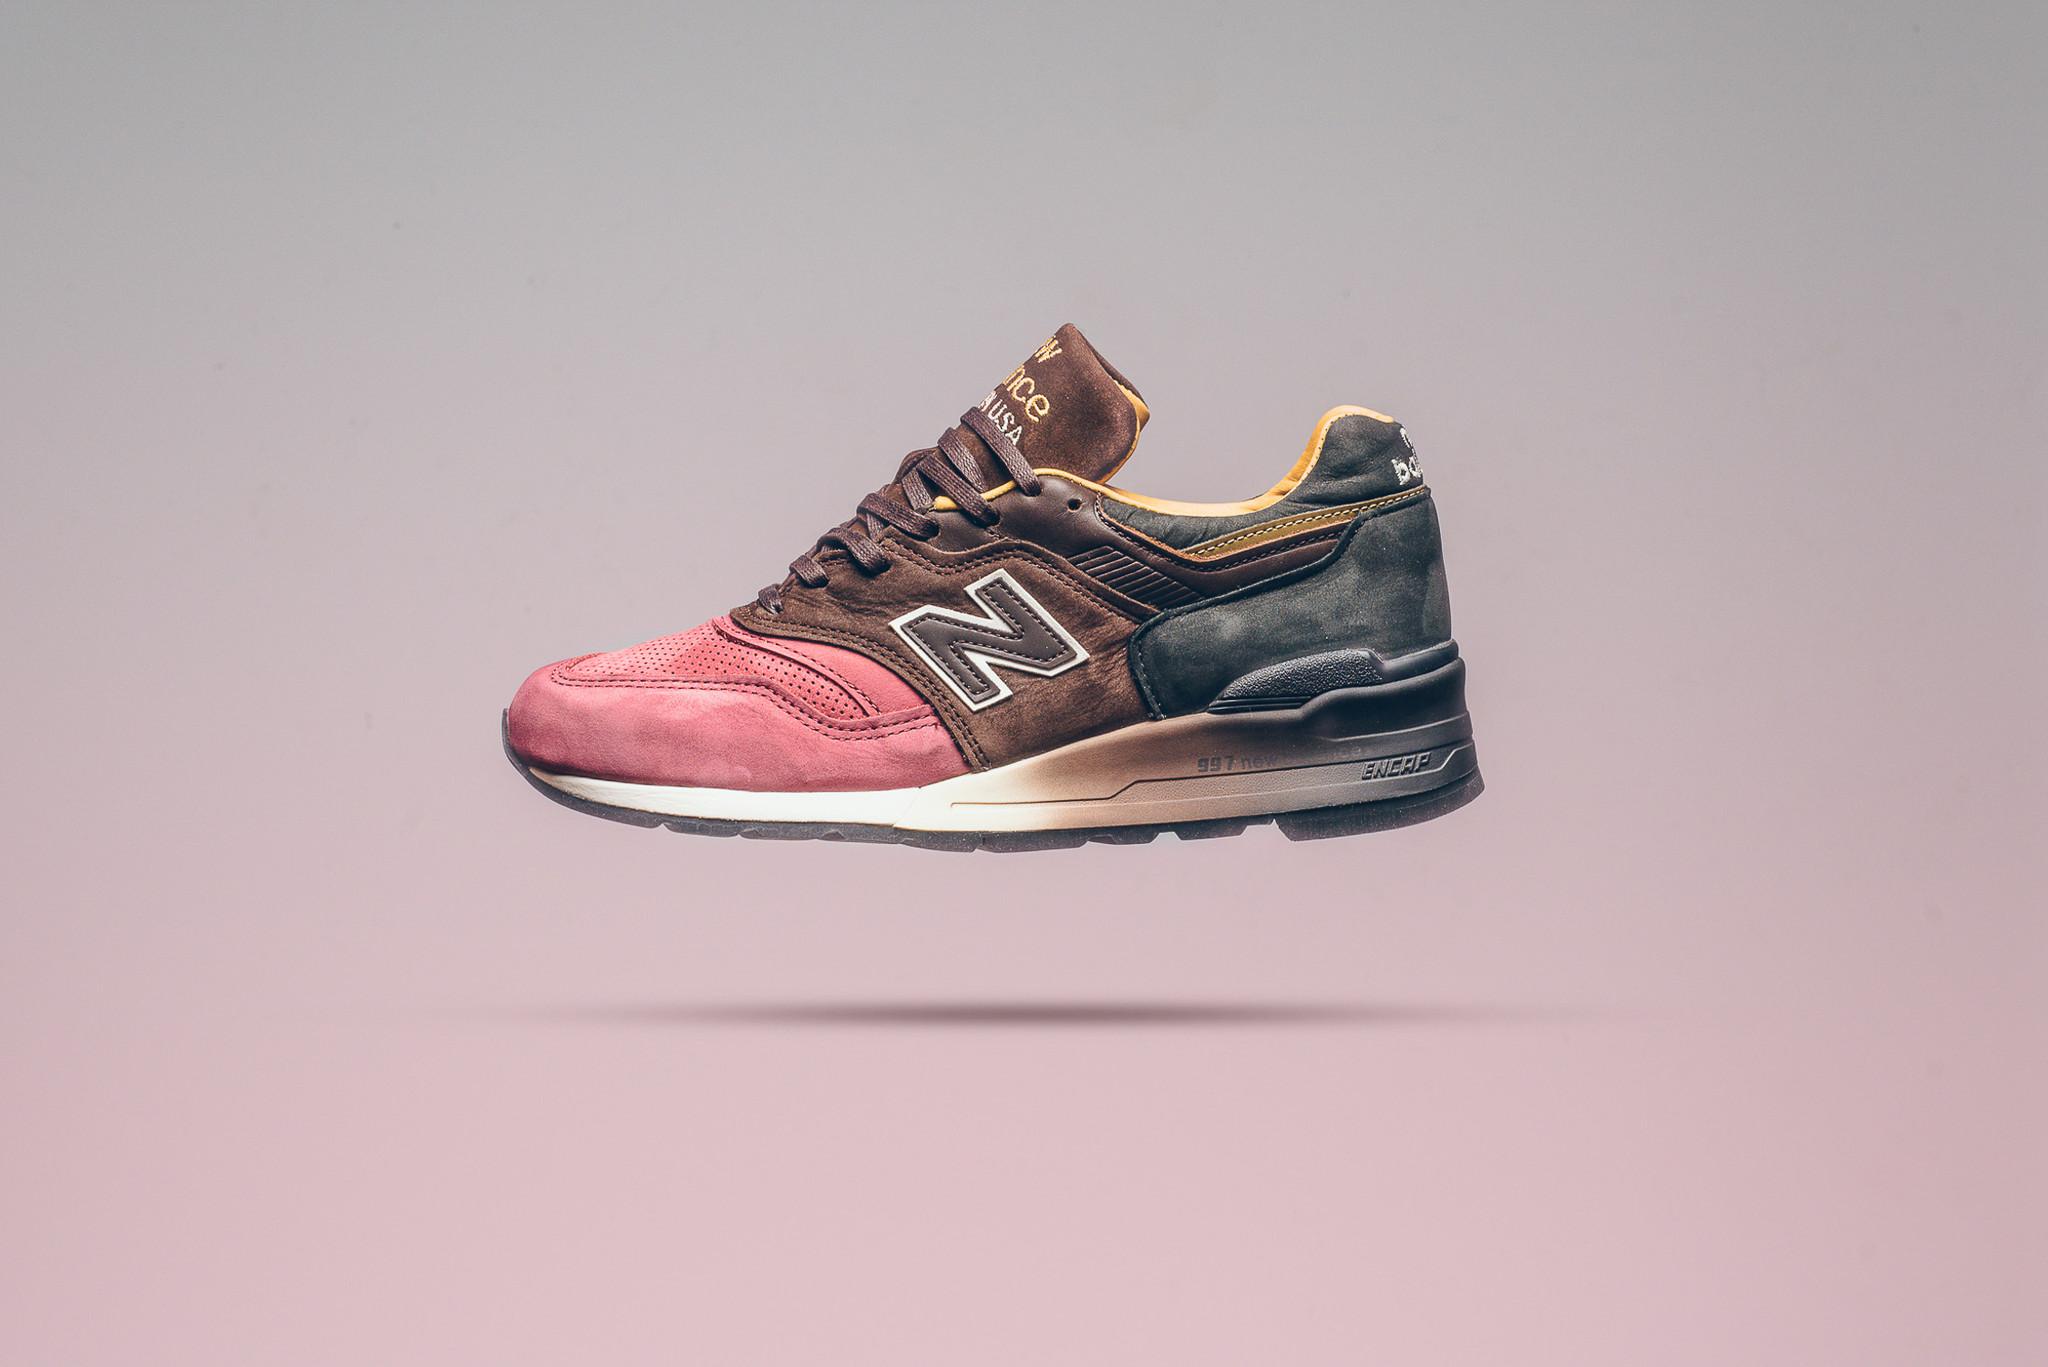 new balance 997 limited edition